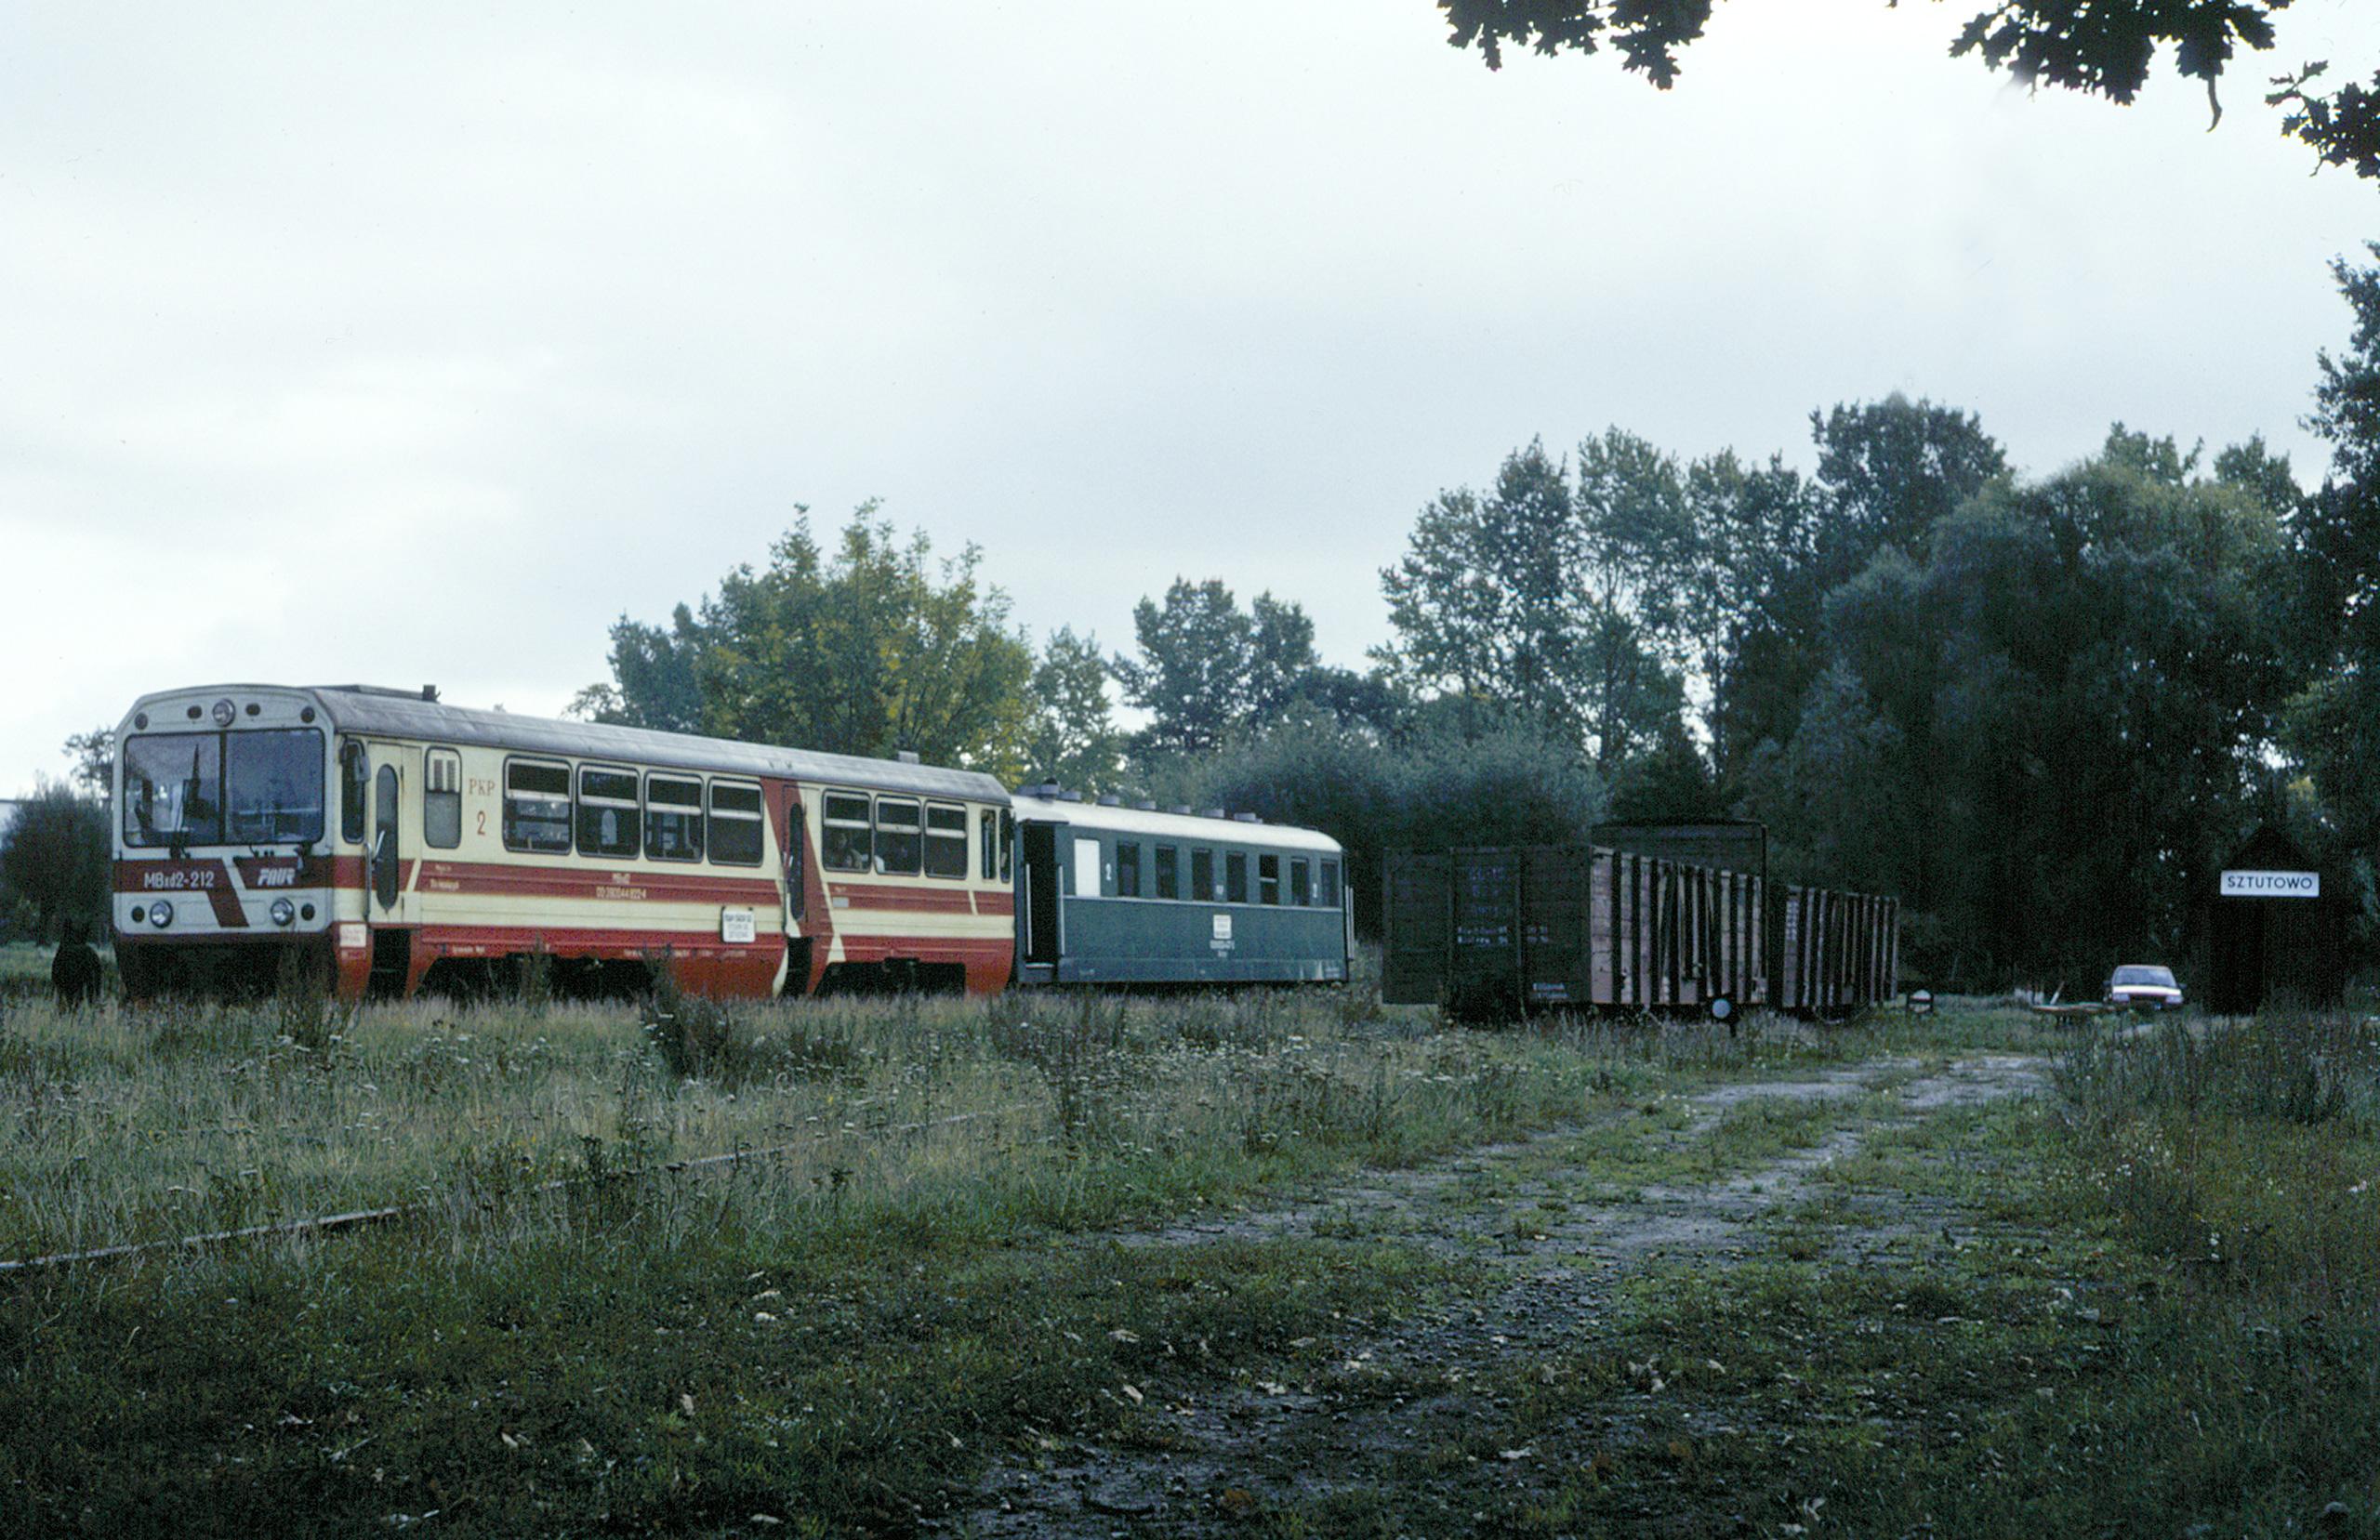 At Stegna Gdańska